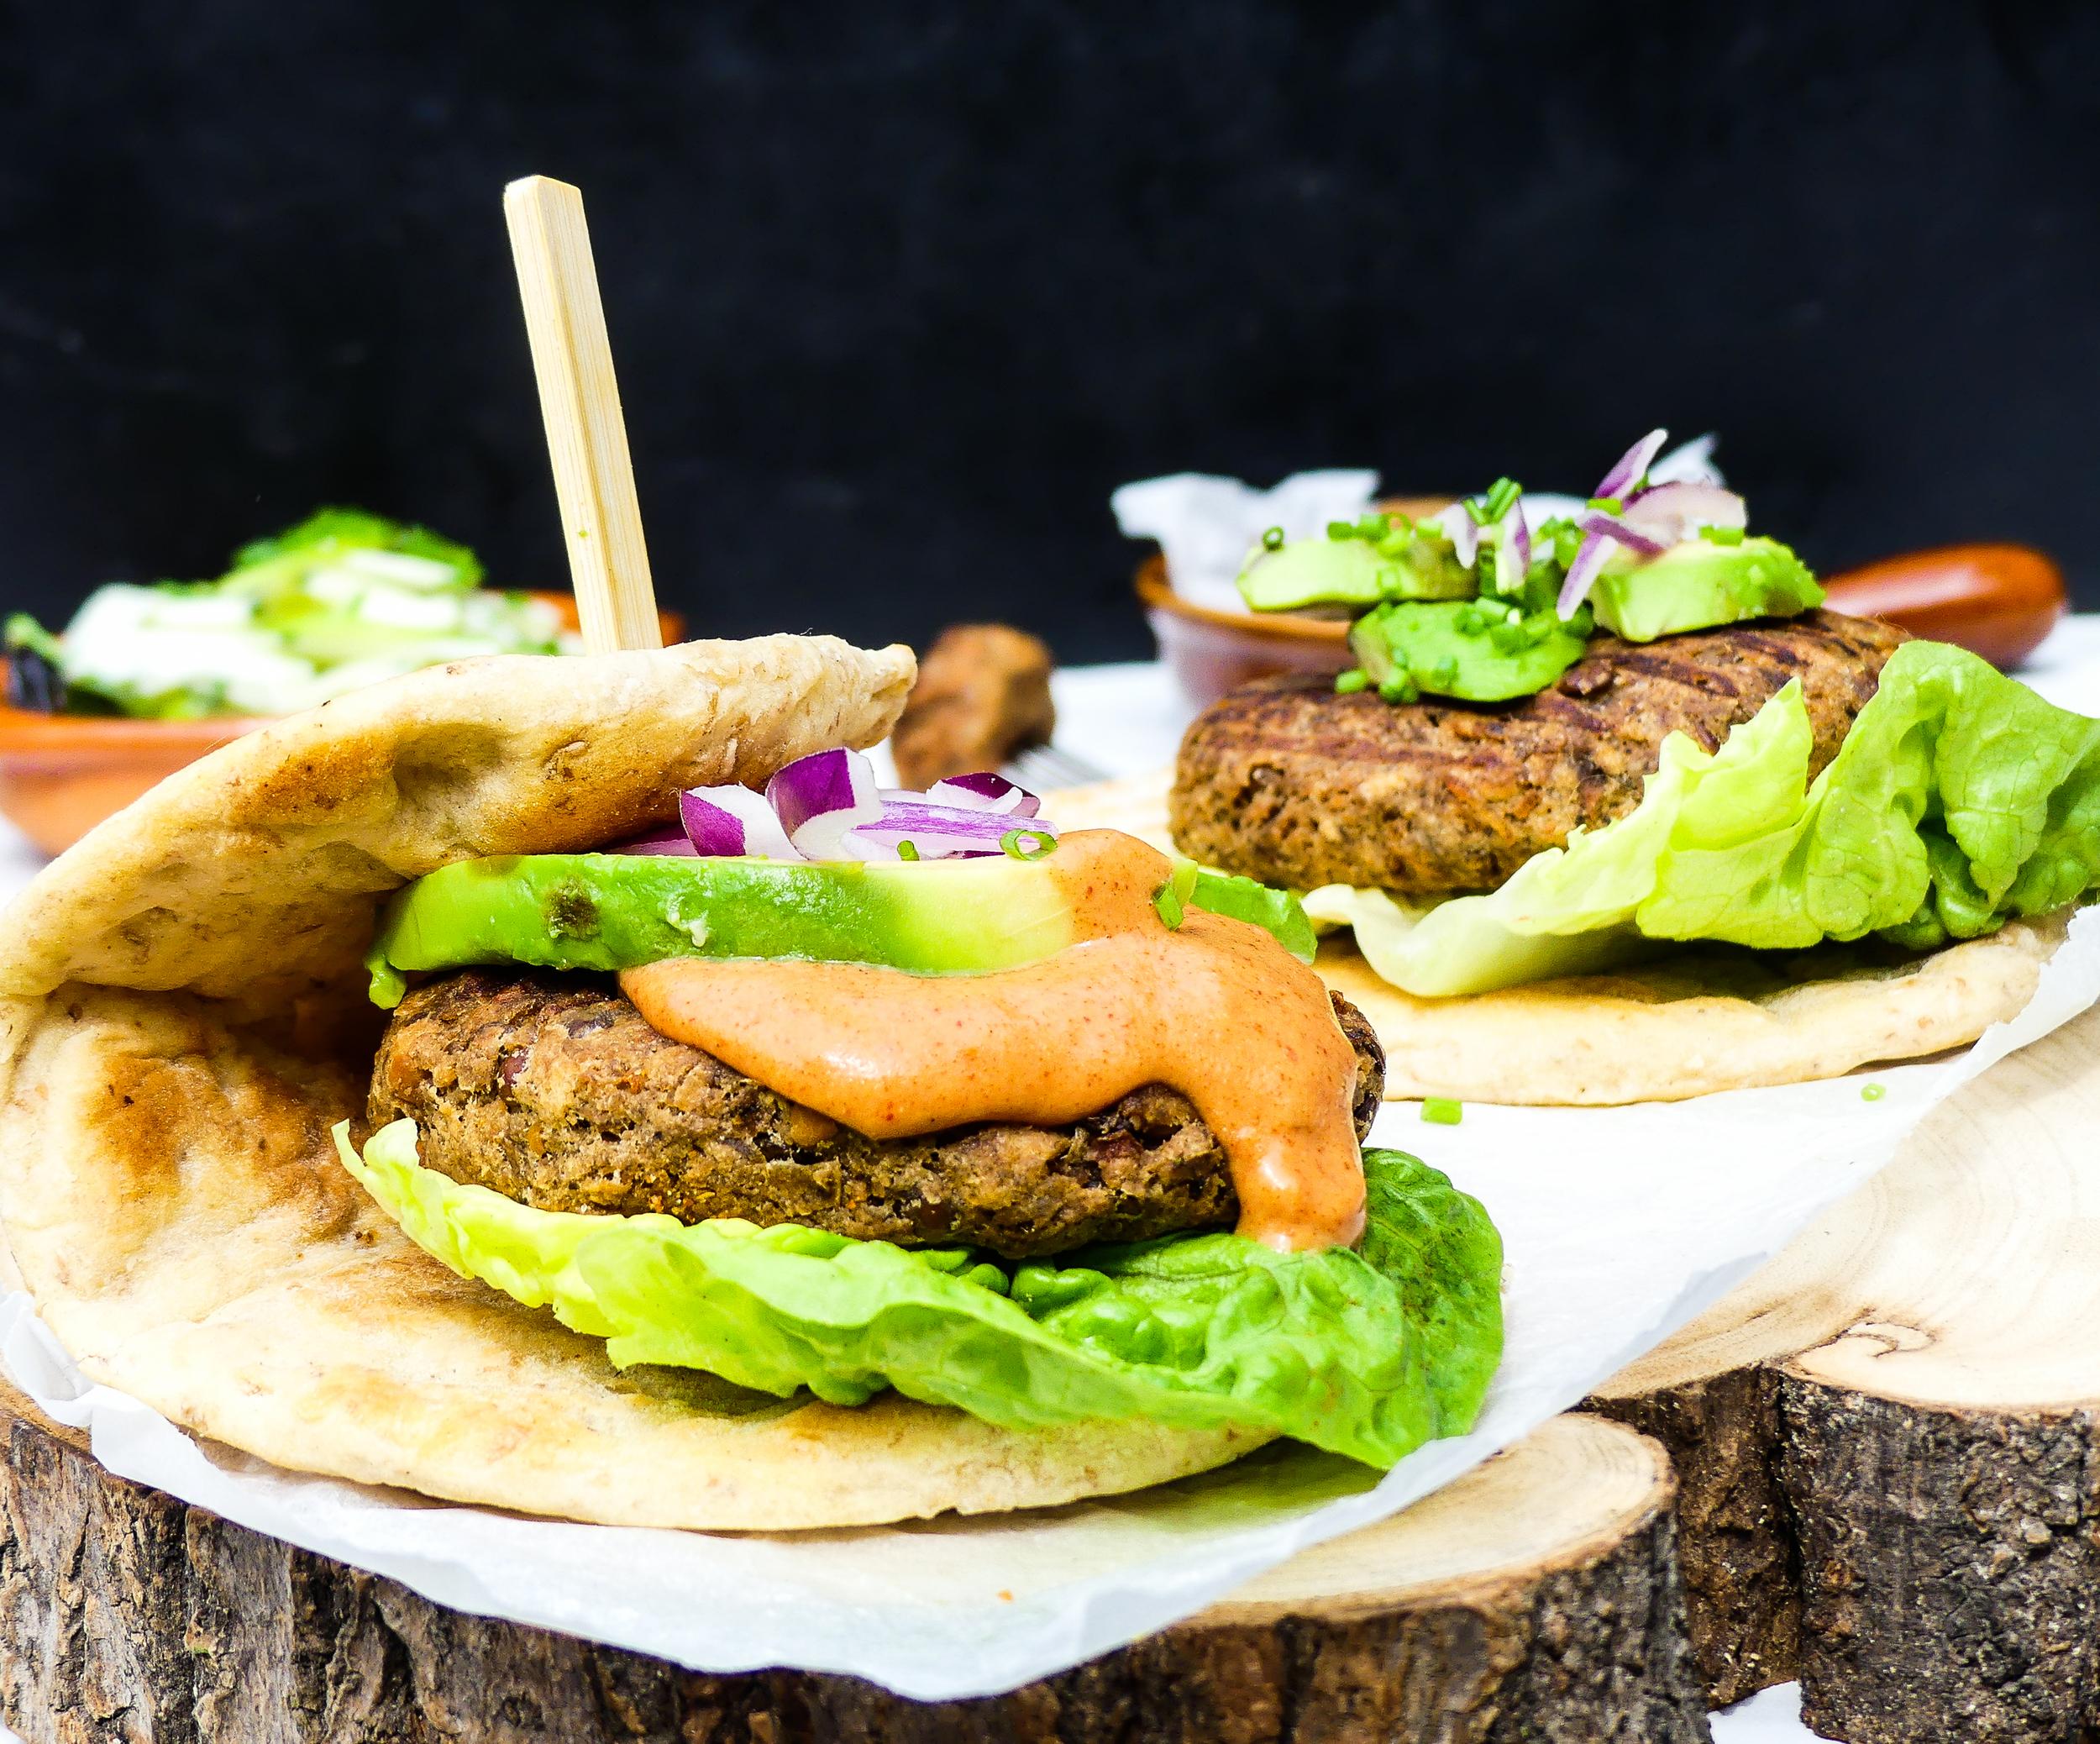 Fully Vegan, Chick Pea & Lentil Burger on self made pita bread!2